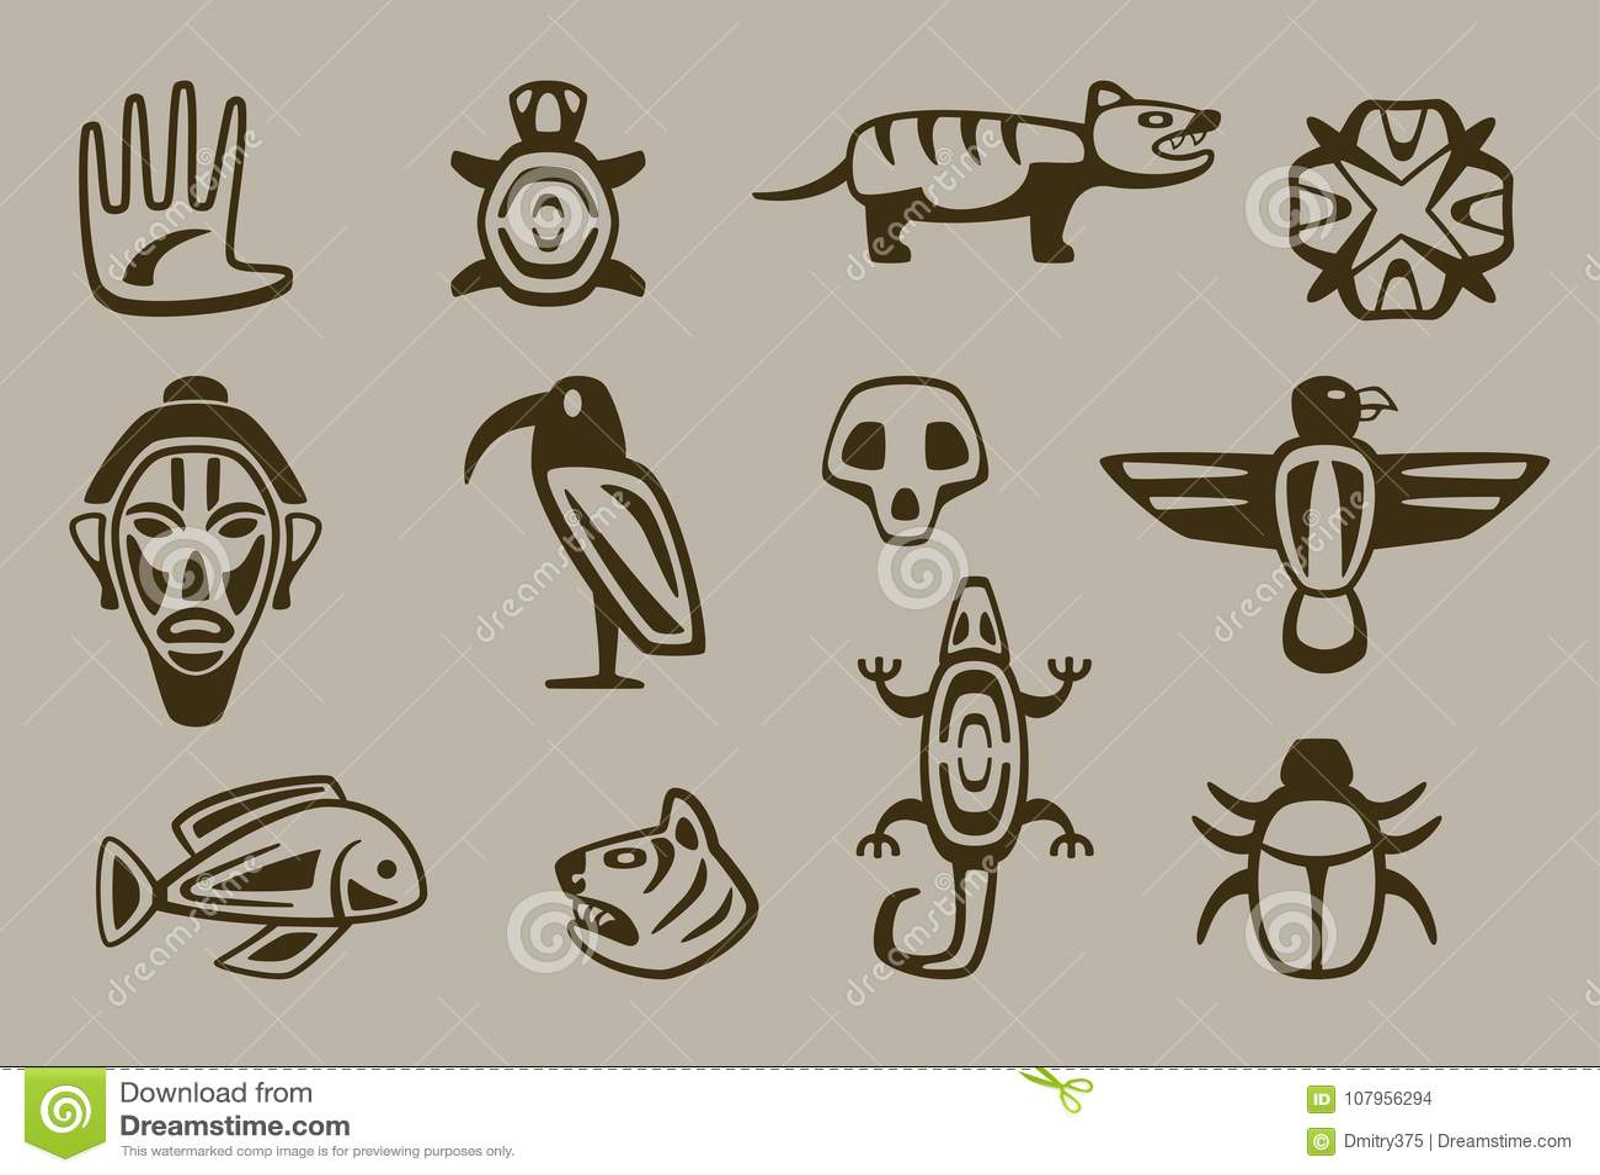 Set Of Stylized Native American Symbols Stock Vector Illustration